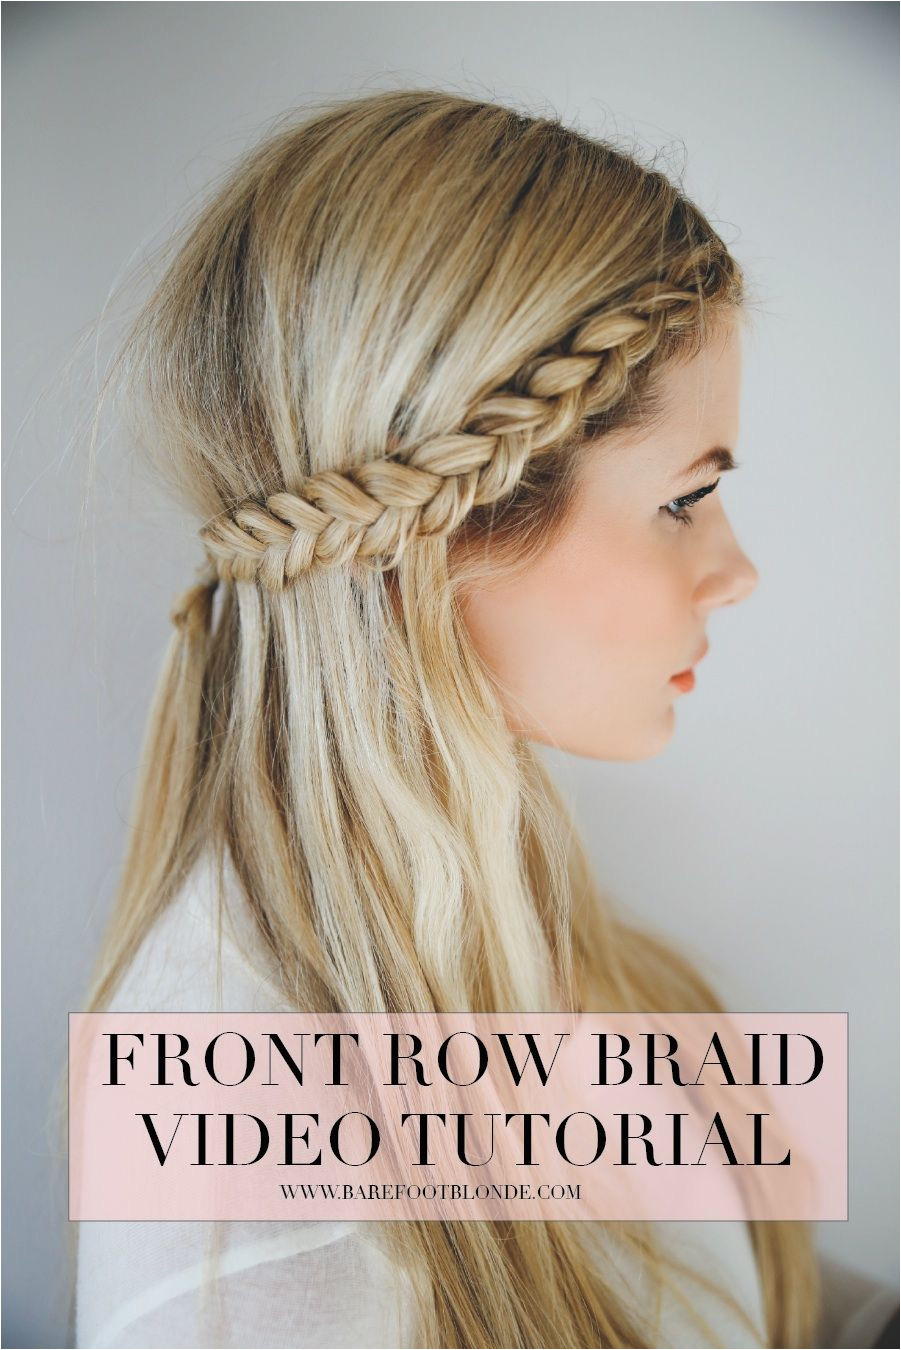 Hairstyles Tutorial App Front Row Braid Tutorial Tutorials & Tips